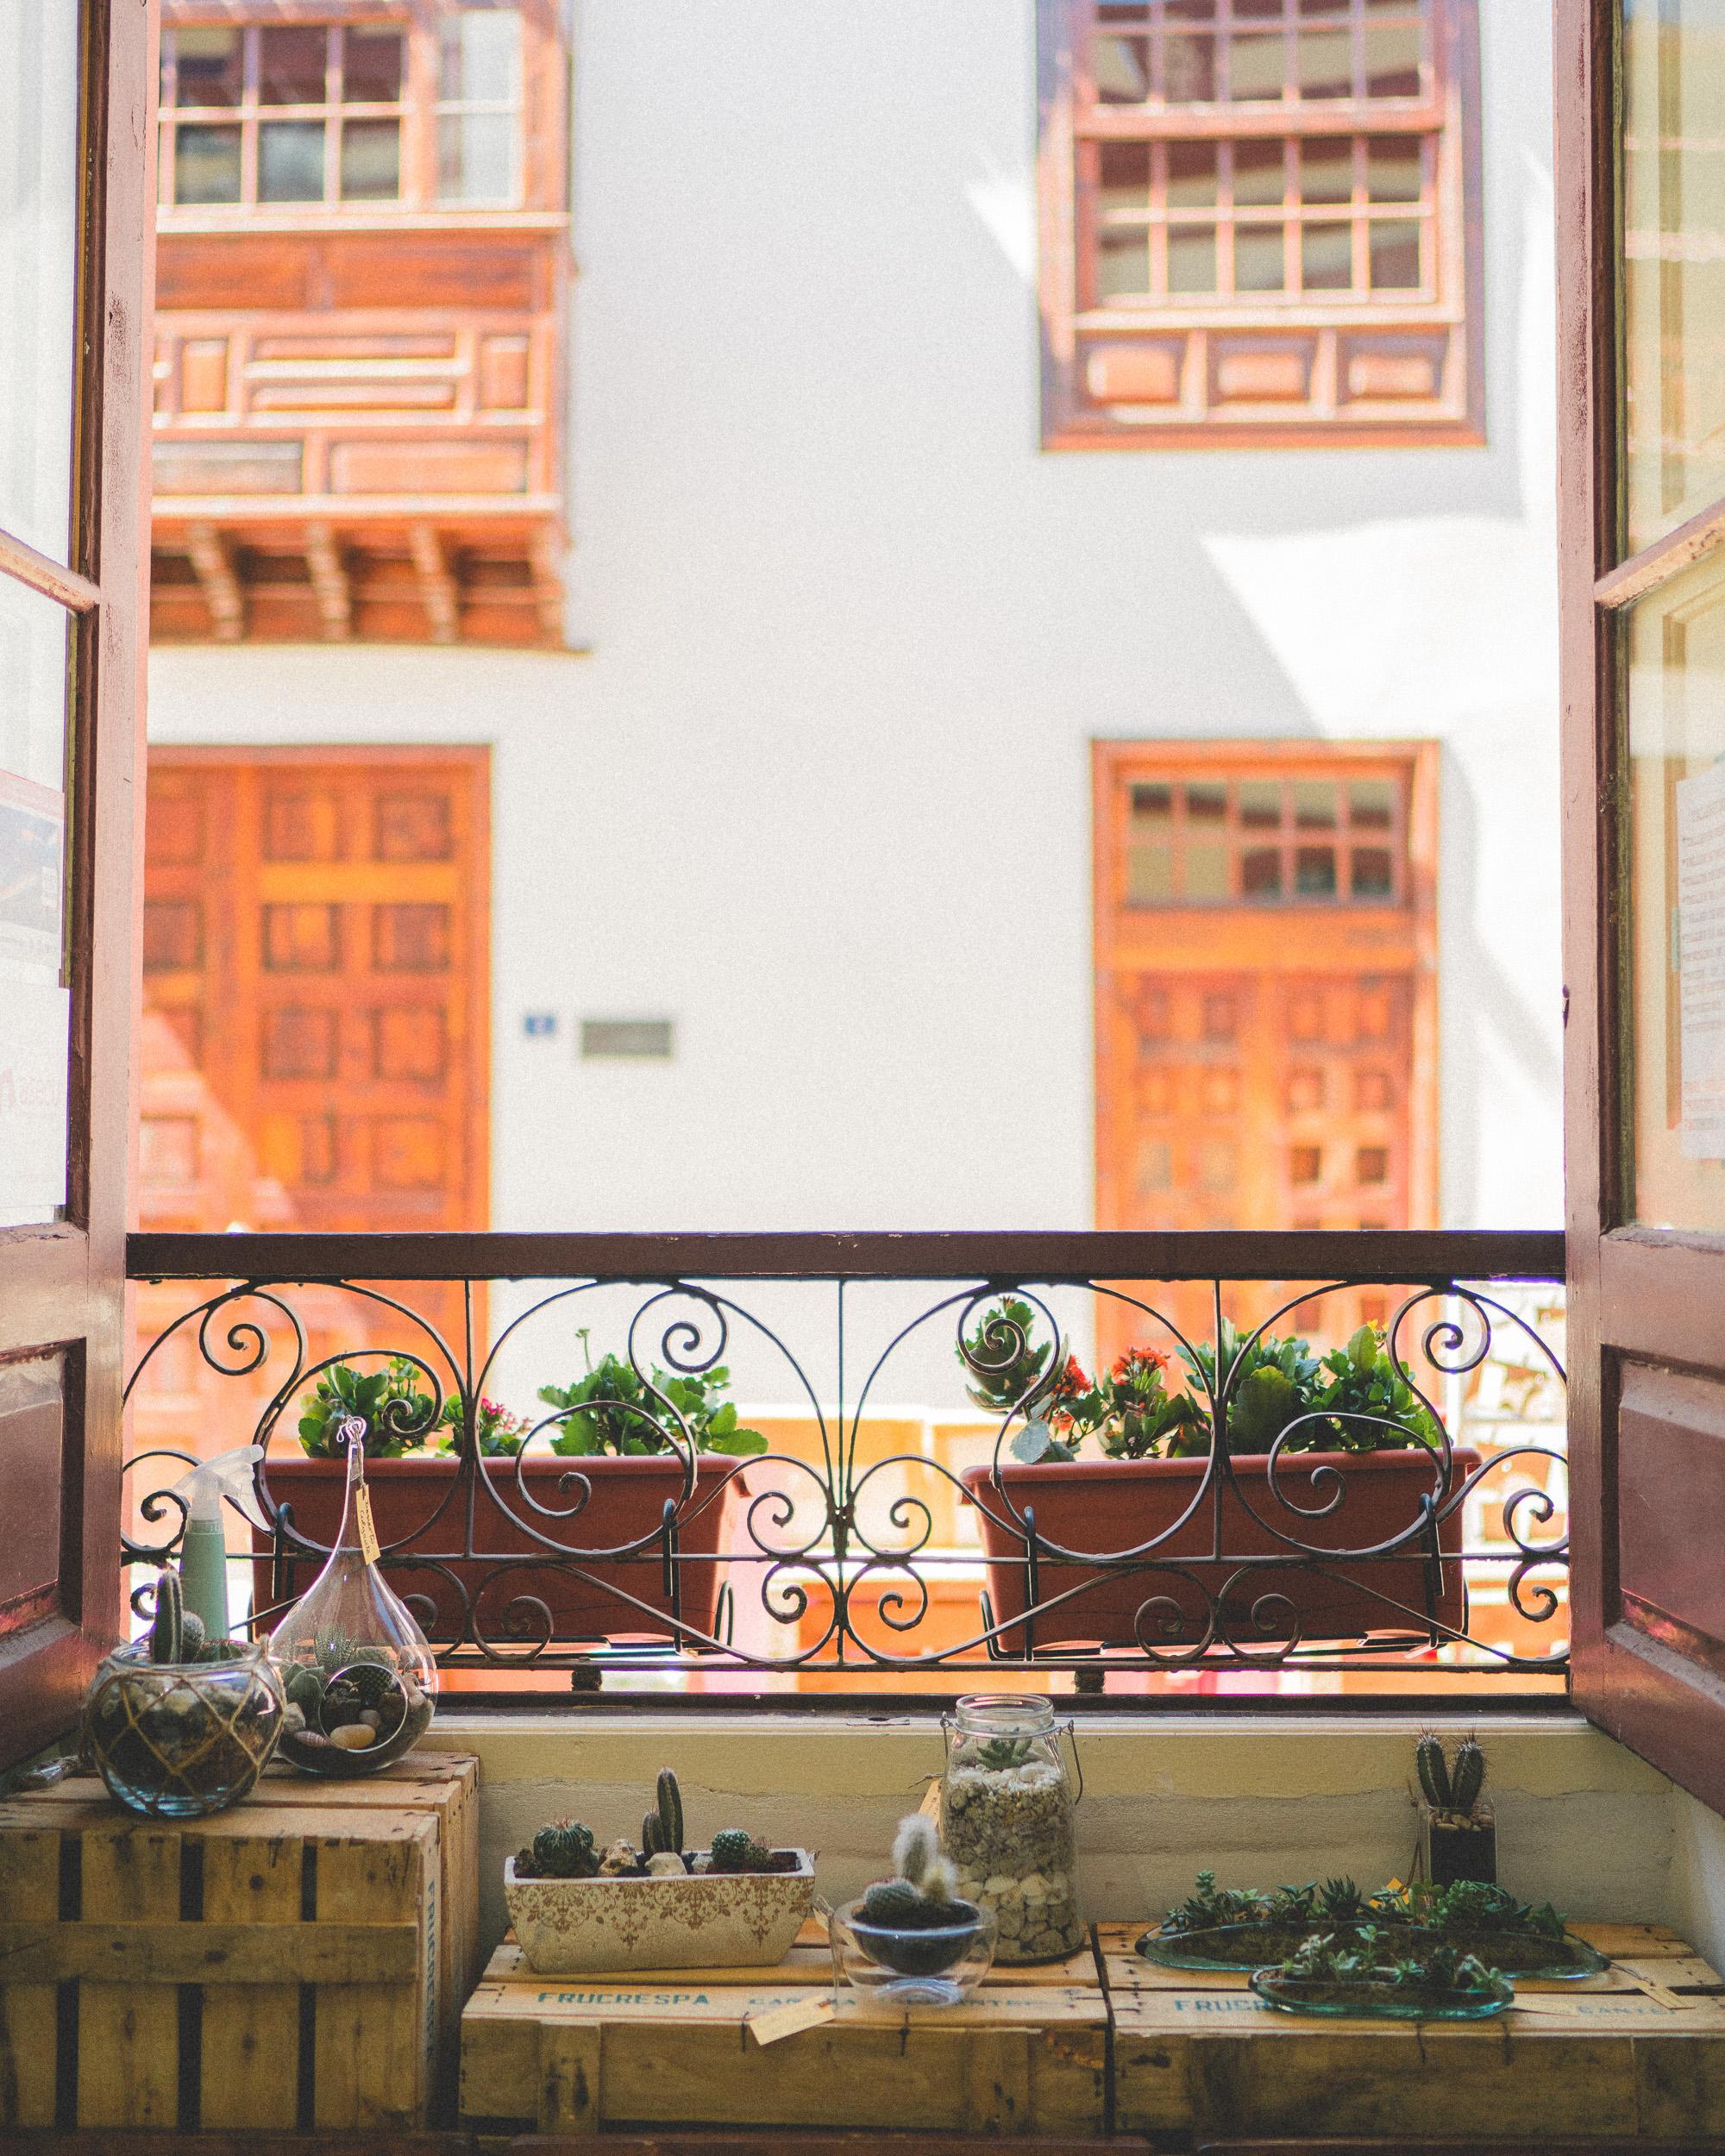 Historic Town San Cristobal De La Laguna in Tenerife, Canary Islands, Spain